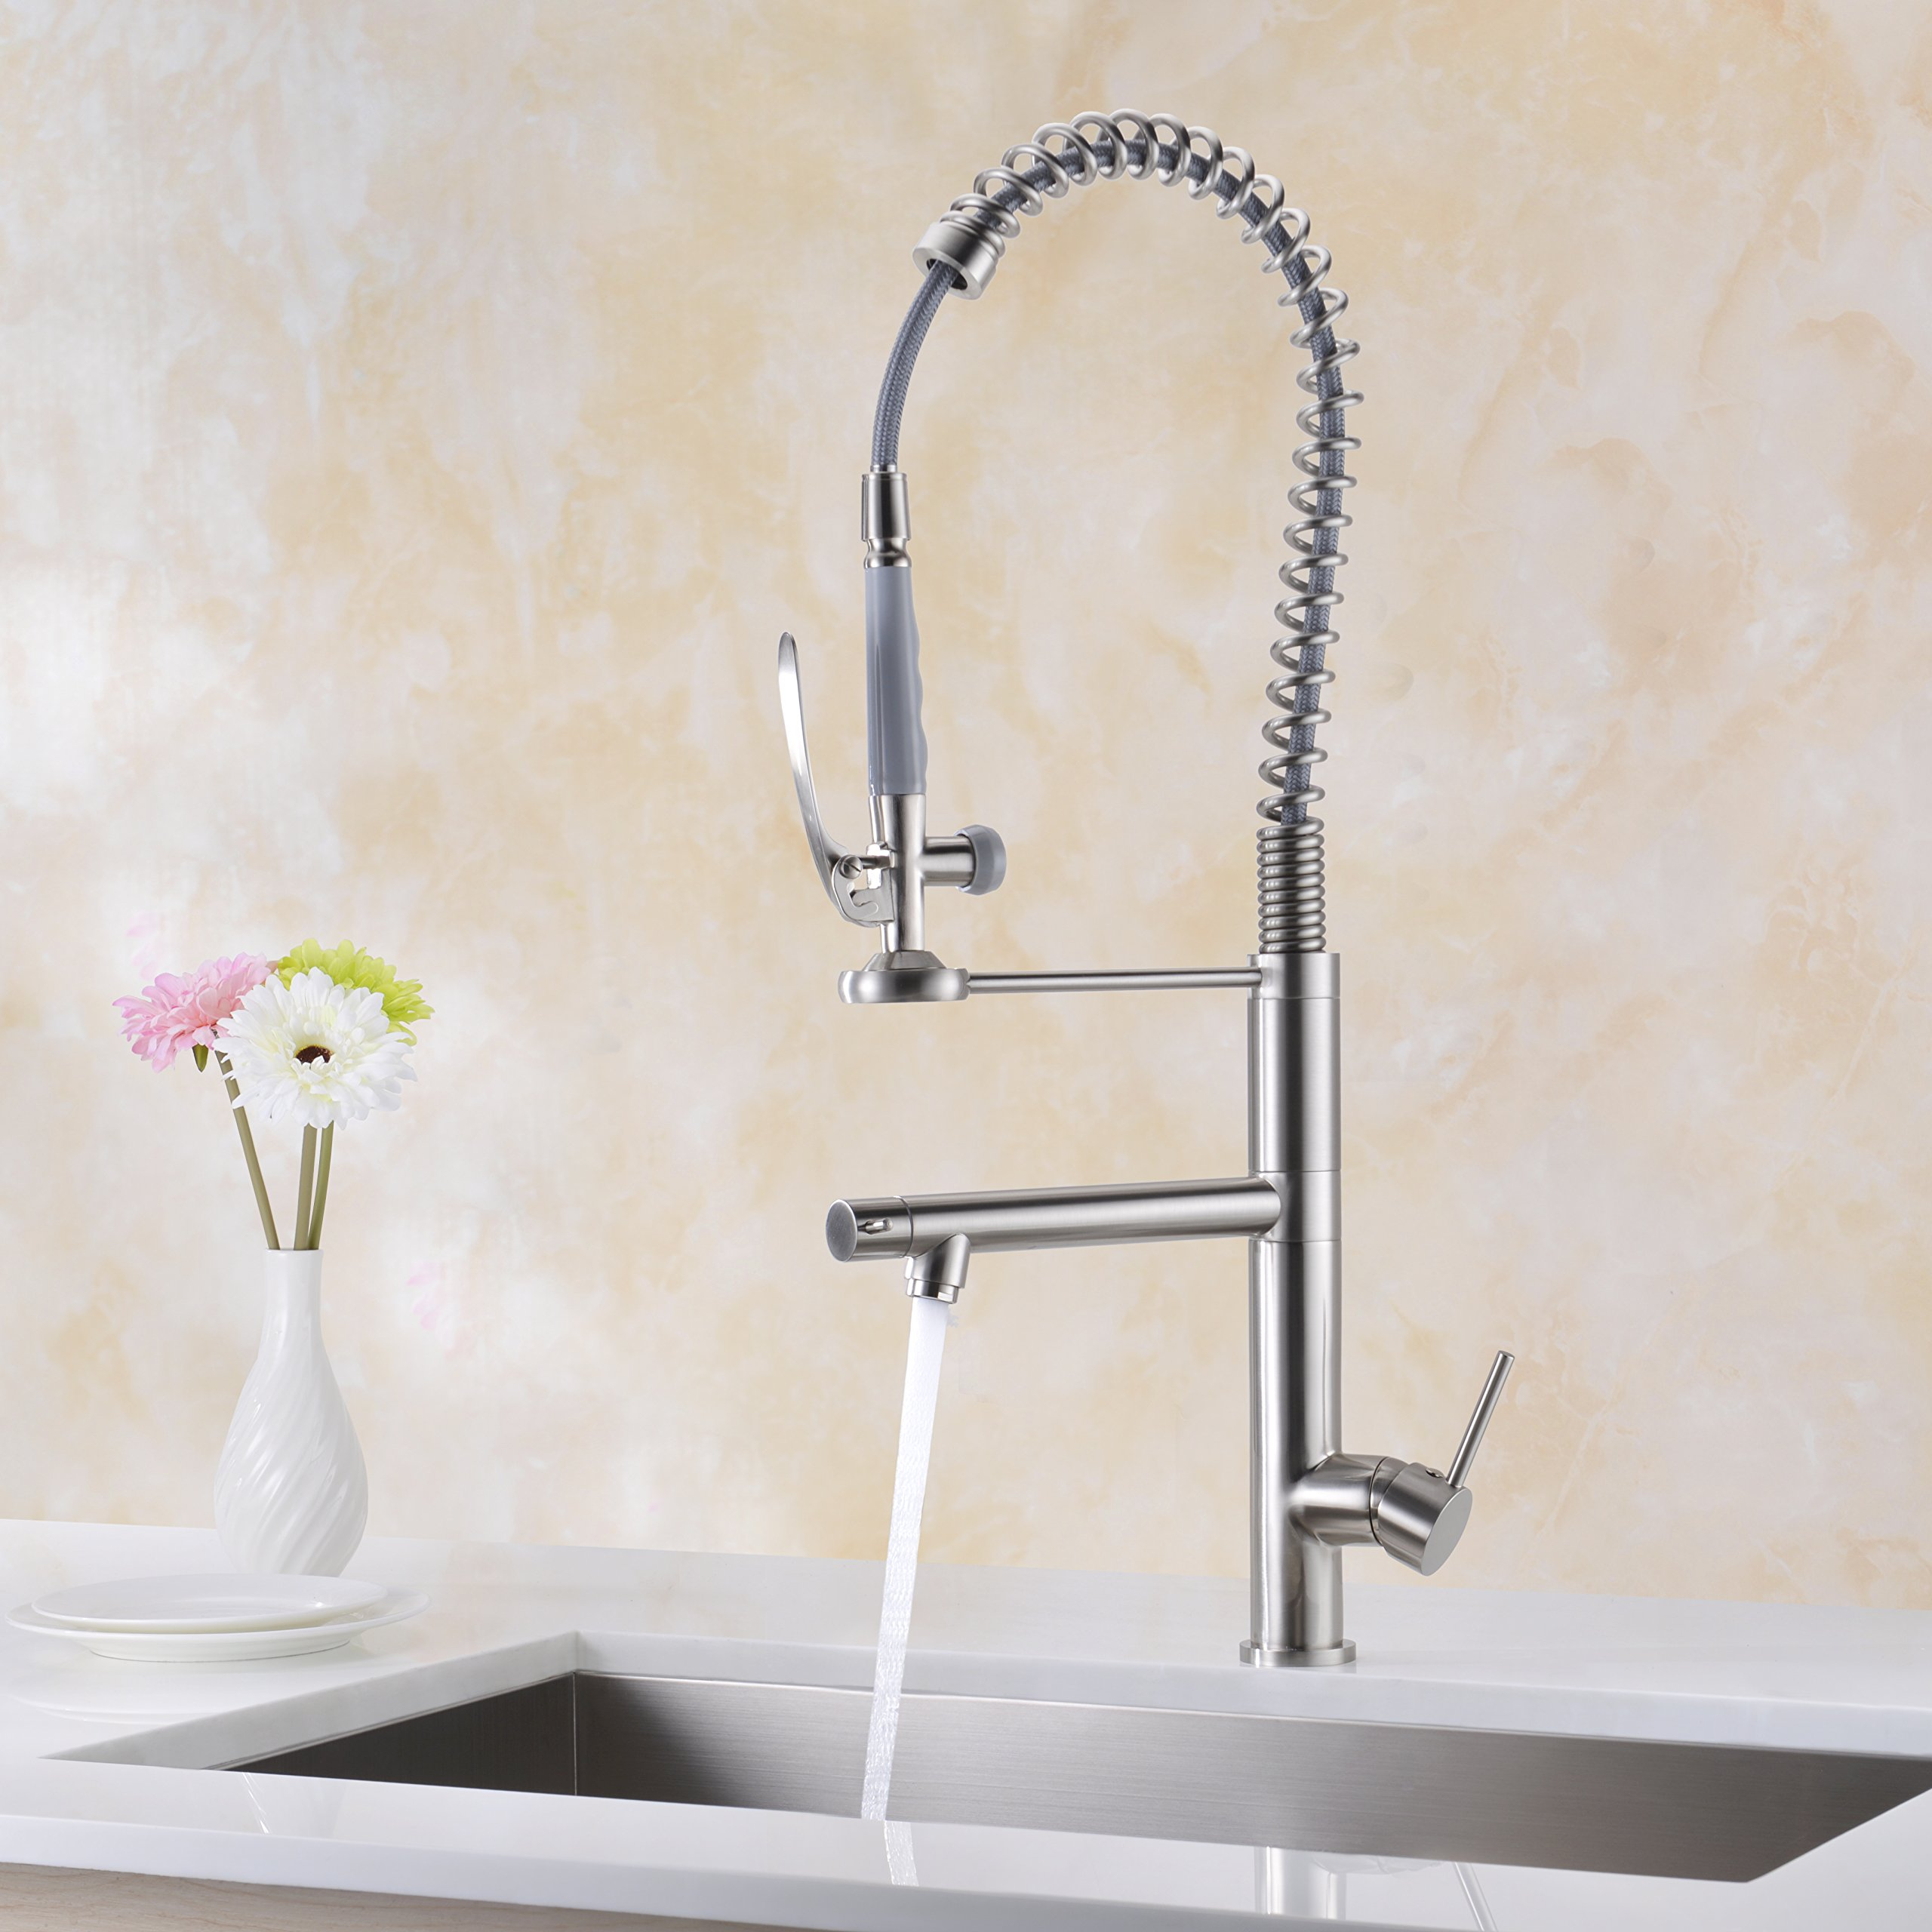 Kitchen Faucet ,WENKEN Brushed Nickel Modern Single Handle Kitchen ...